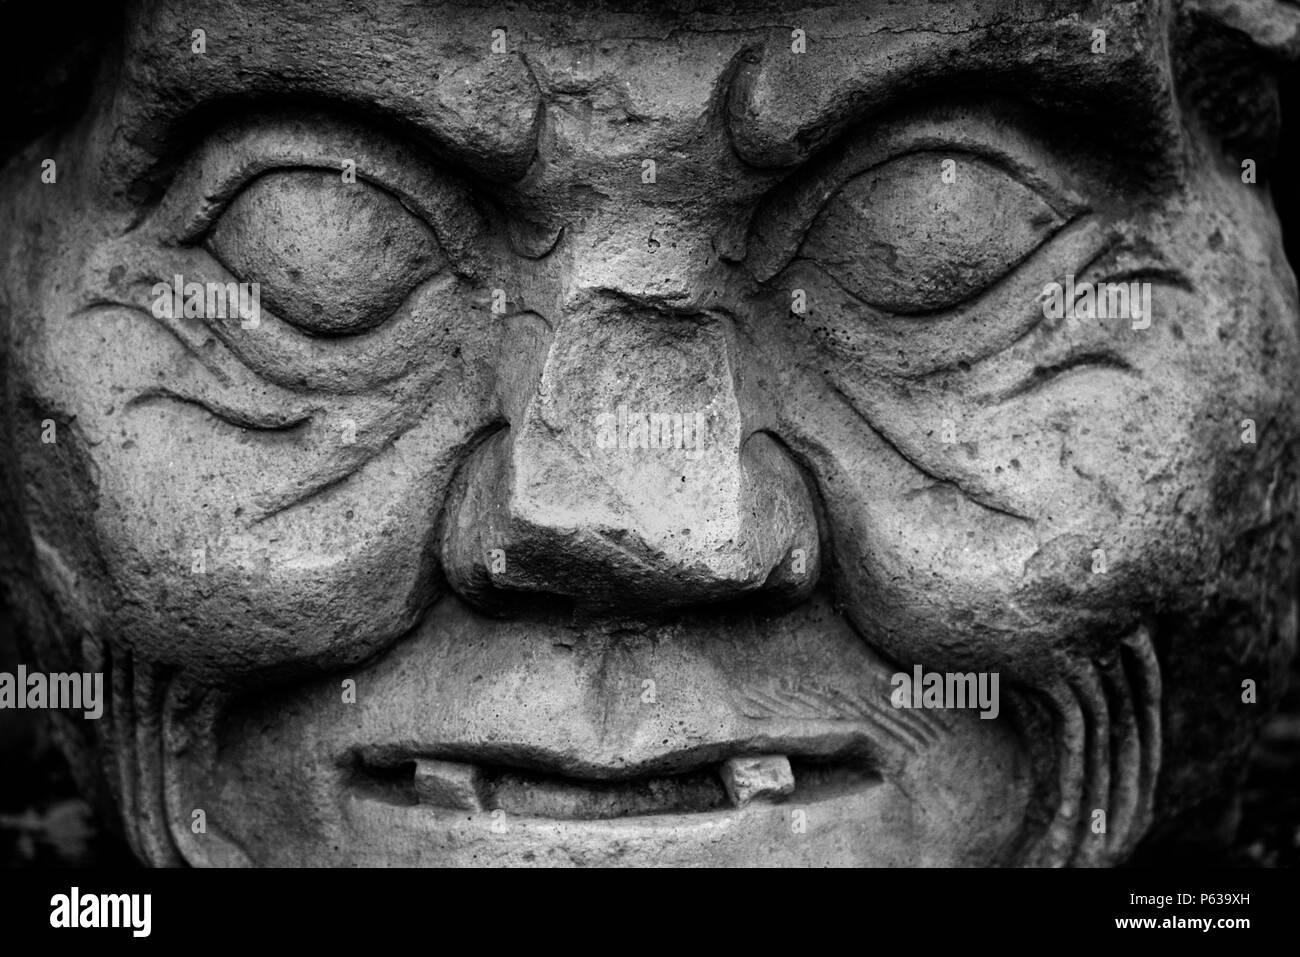 STONE SCULPTURE of MAYAN GOD of MEDECINE & SCIENCE - COPAN RUINS, HONDURAS Stock Photo